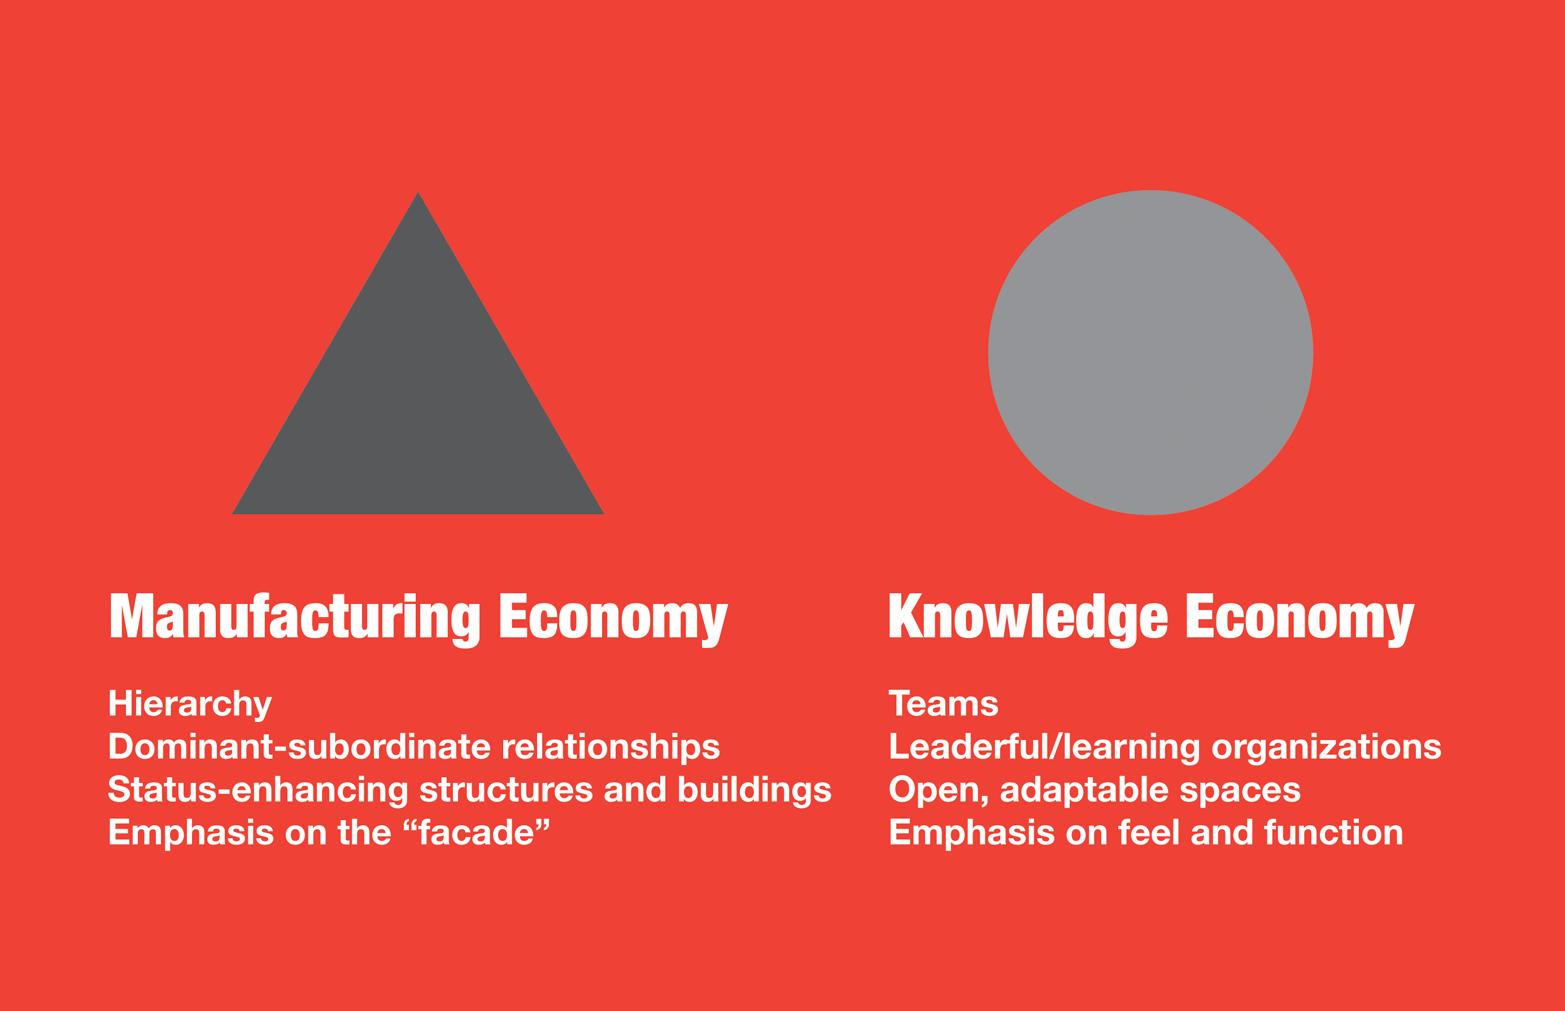 Examining organizational structure